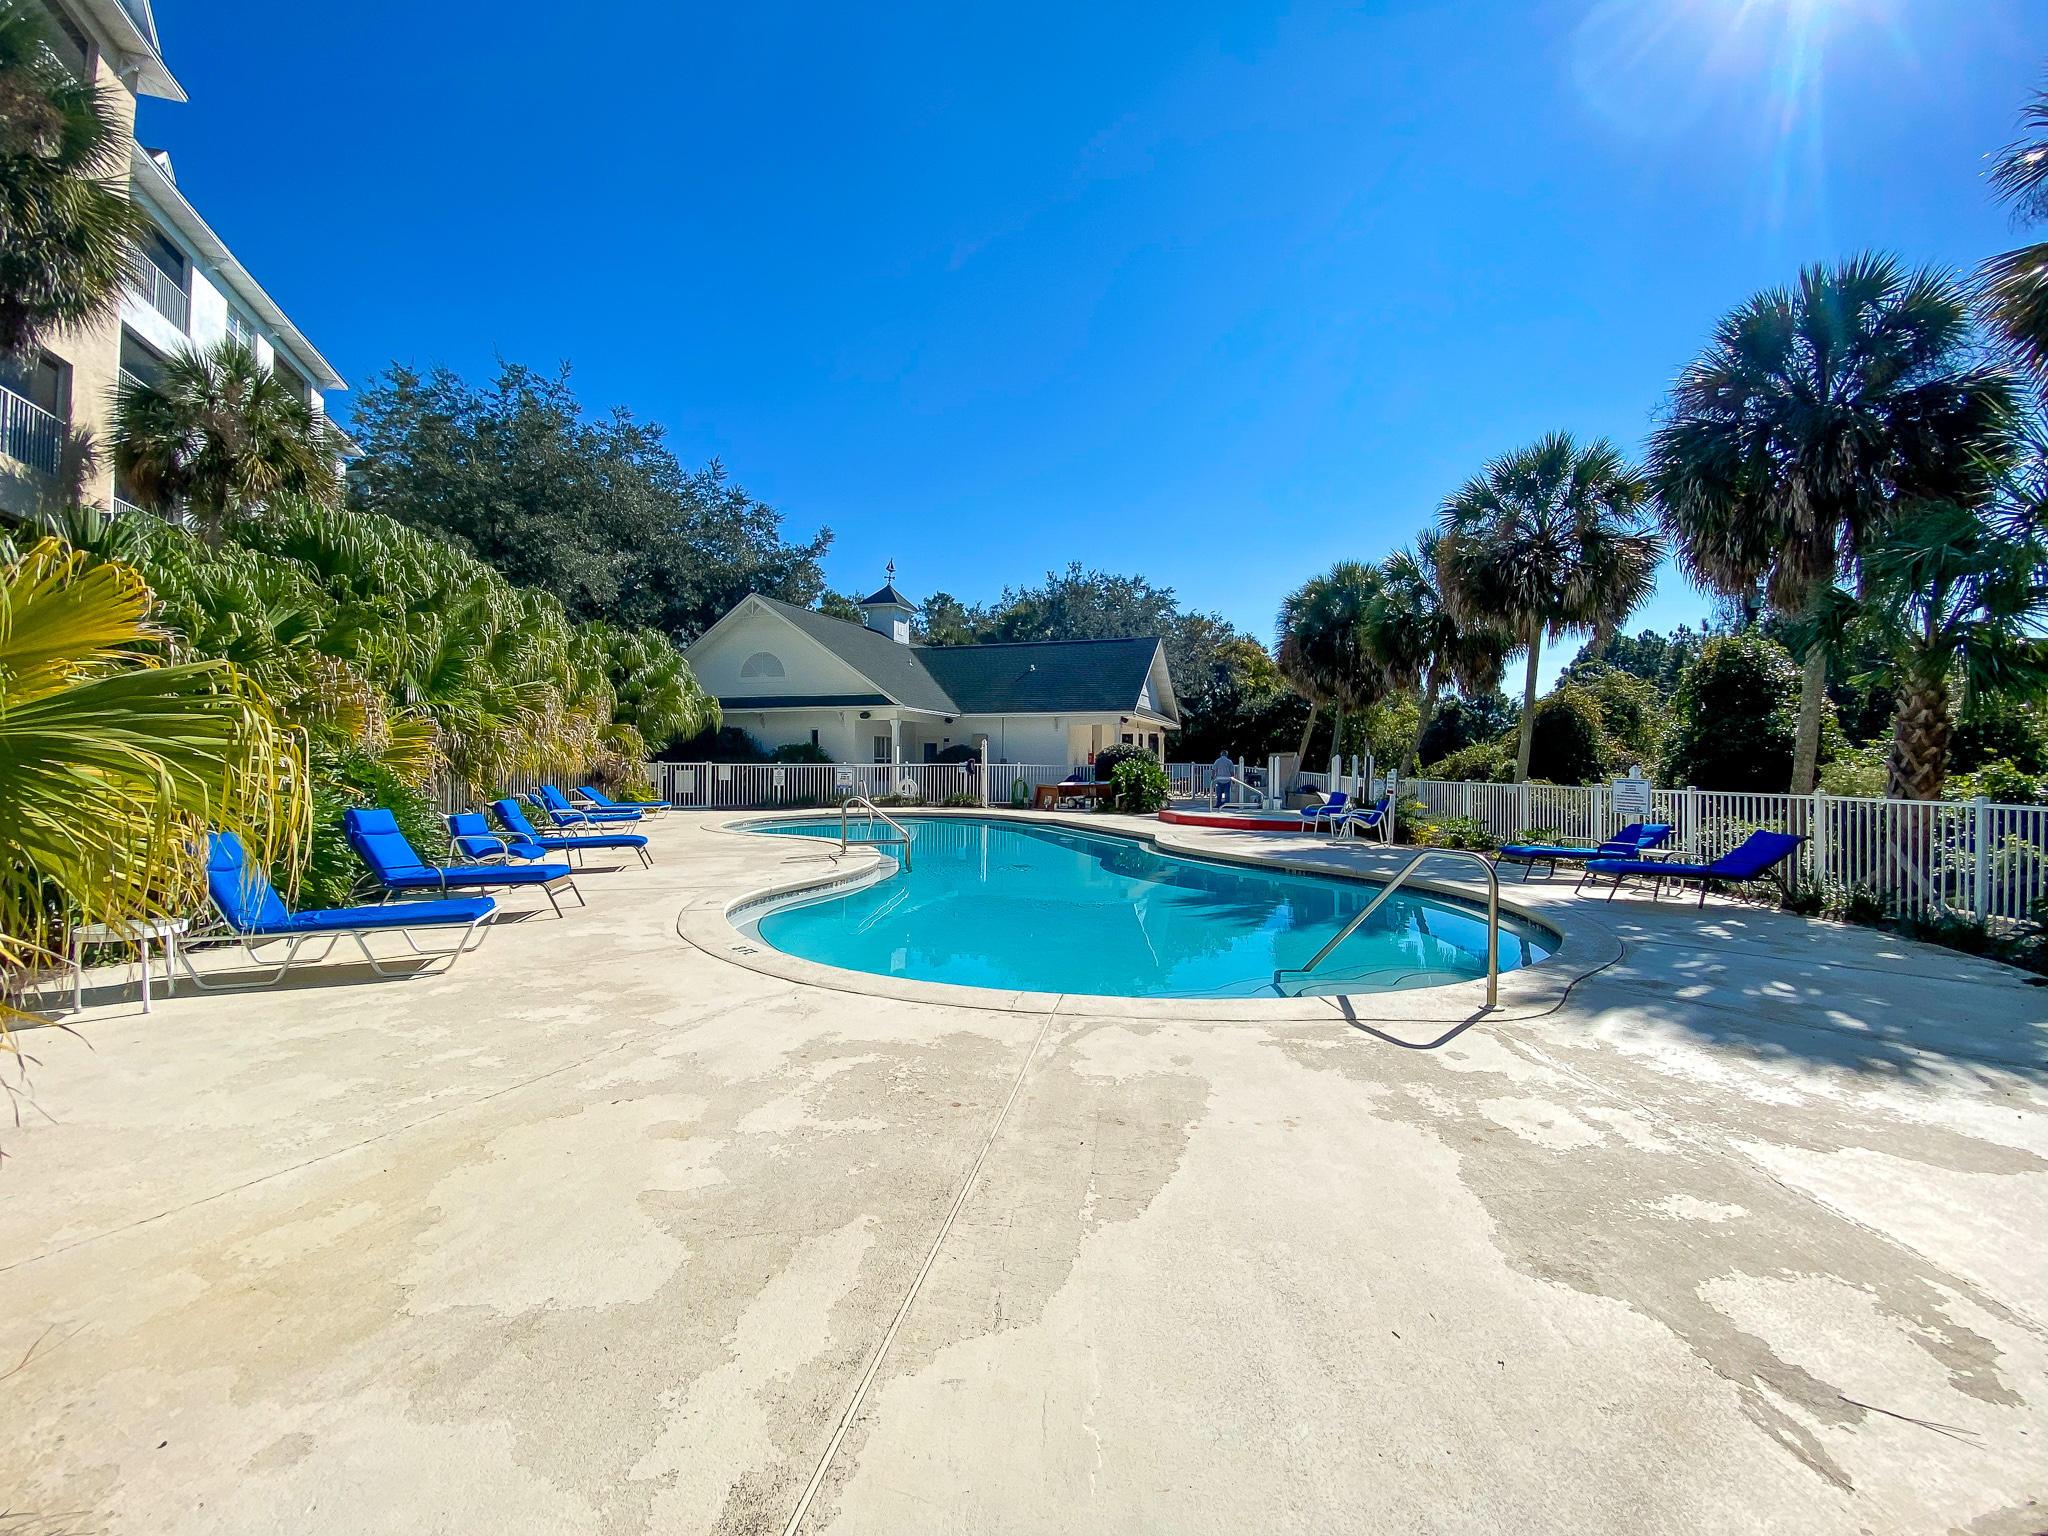 Photo of home for sale at 4270 Calinda, Niceville FL